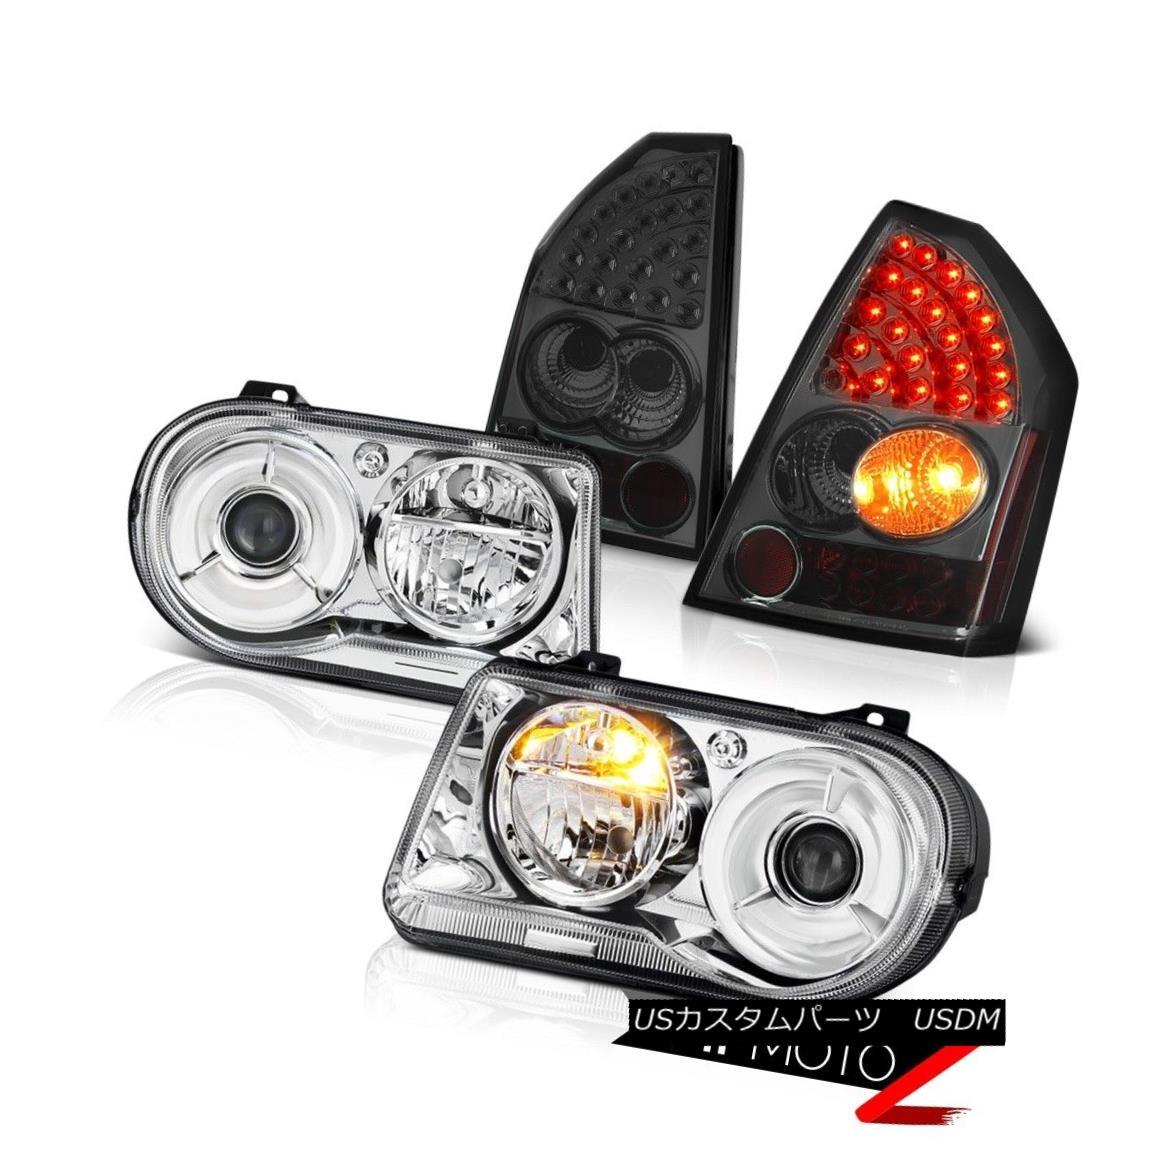 2005 2006 2007 Chrysler 300c Srt8 Clear Black Headlights: ヘッドライト Euro Headlights Pair New Smoke LED オンライン Tail